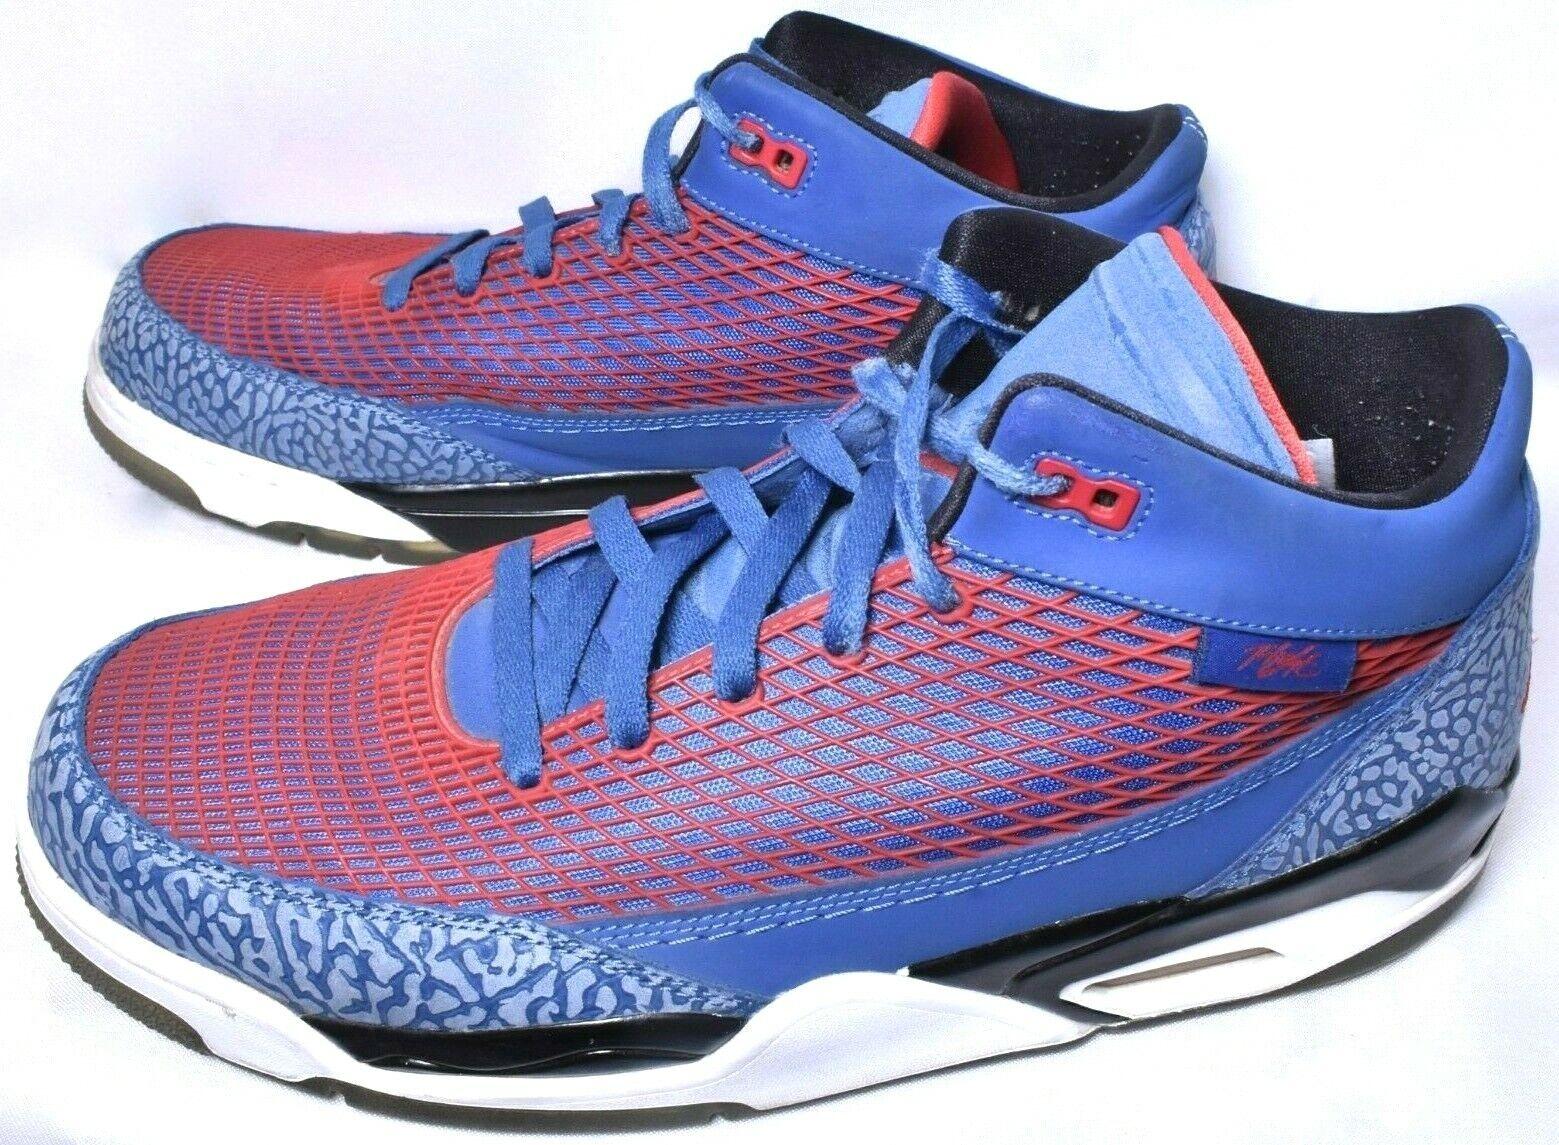 NIKE AIR JORDAN Flight Club 80 Sneakers shoes (Size 13) bluee Red  Pre-Owned